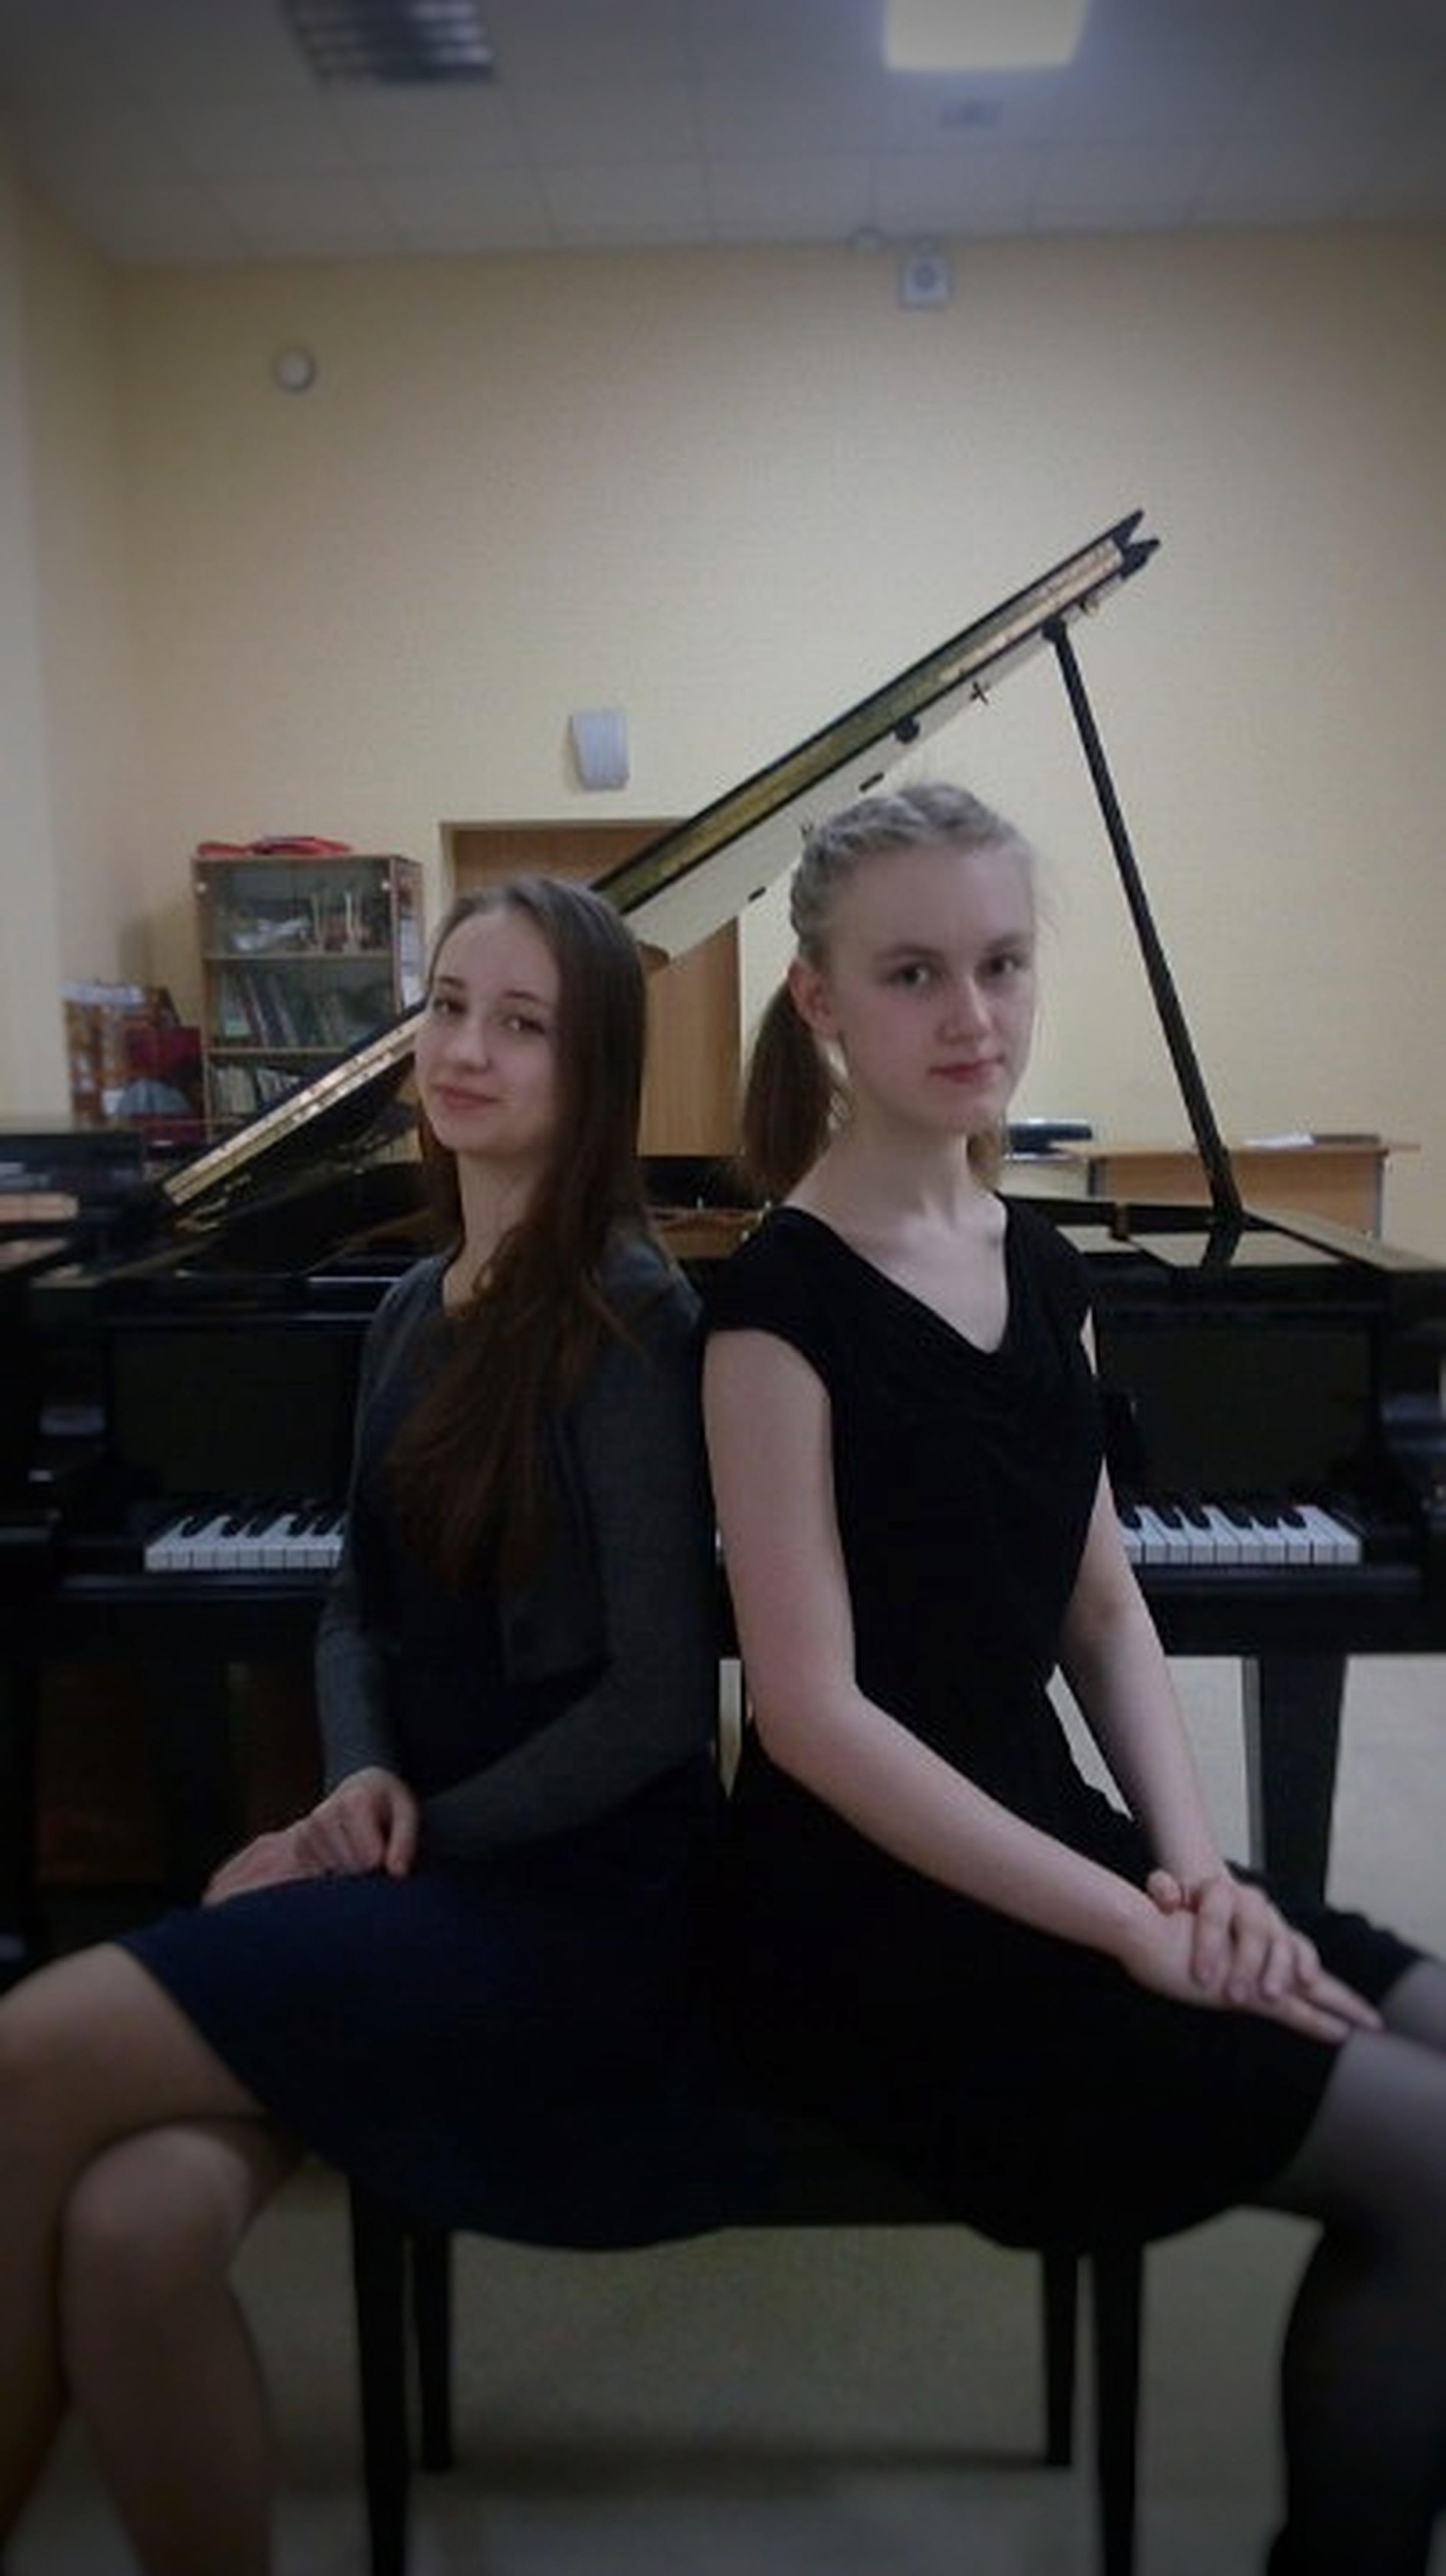 Фортепианный ансамбль🎹 ансамбль ансамблистки рояль пианистки калининград музыкальныйколледж фортепианныйдуэт Ensemble Grandpiano Pianists Kaliningrad Musiccollege Pianoduo